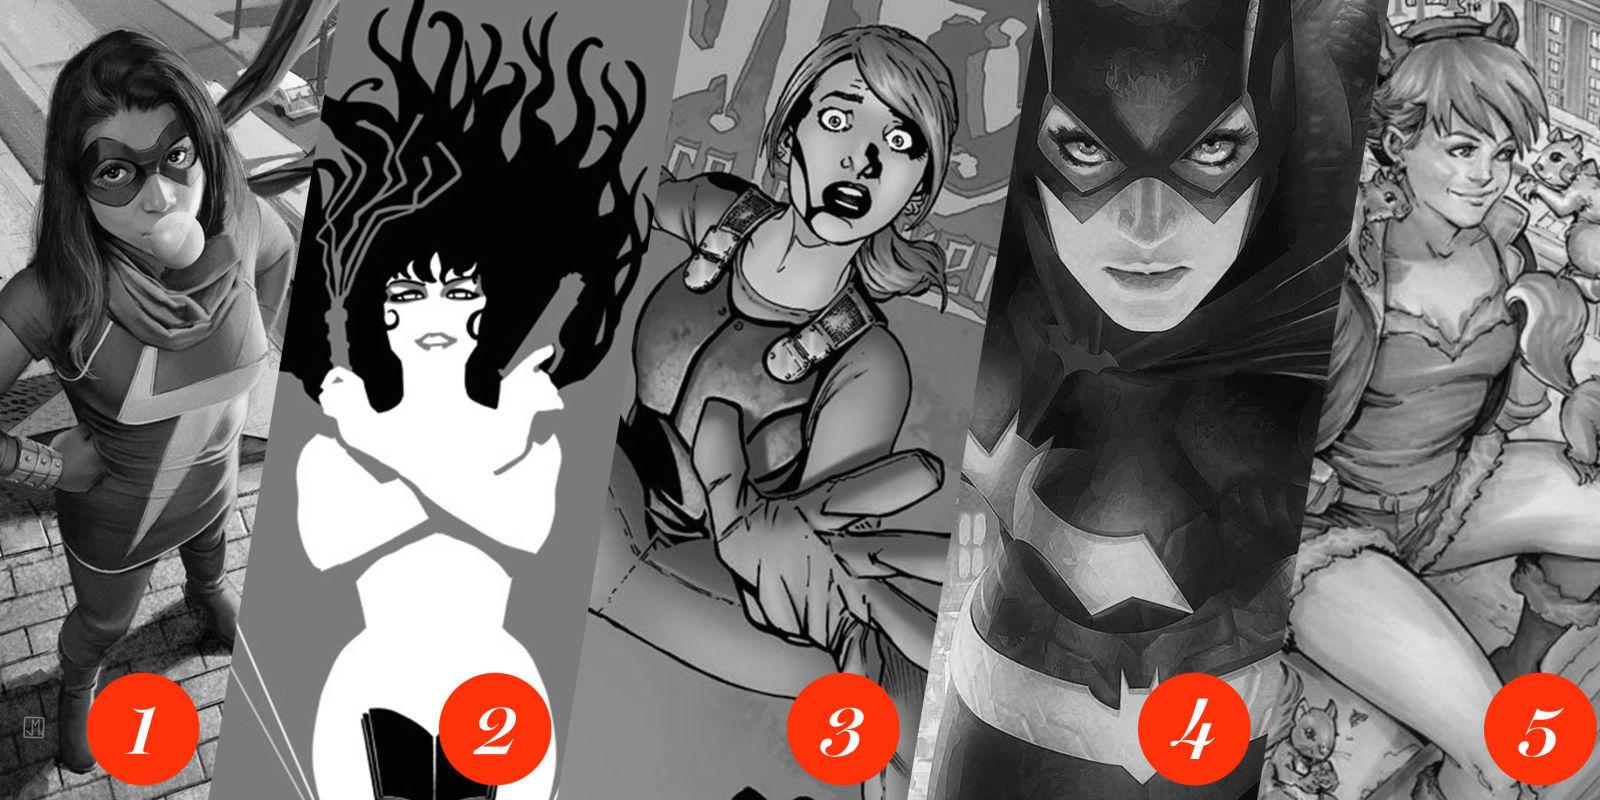 from Juan nude girls in superheroes costumes